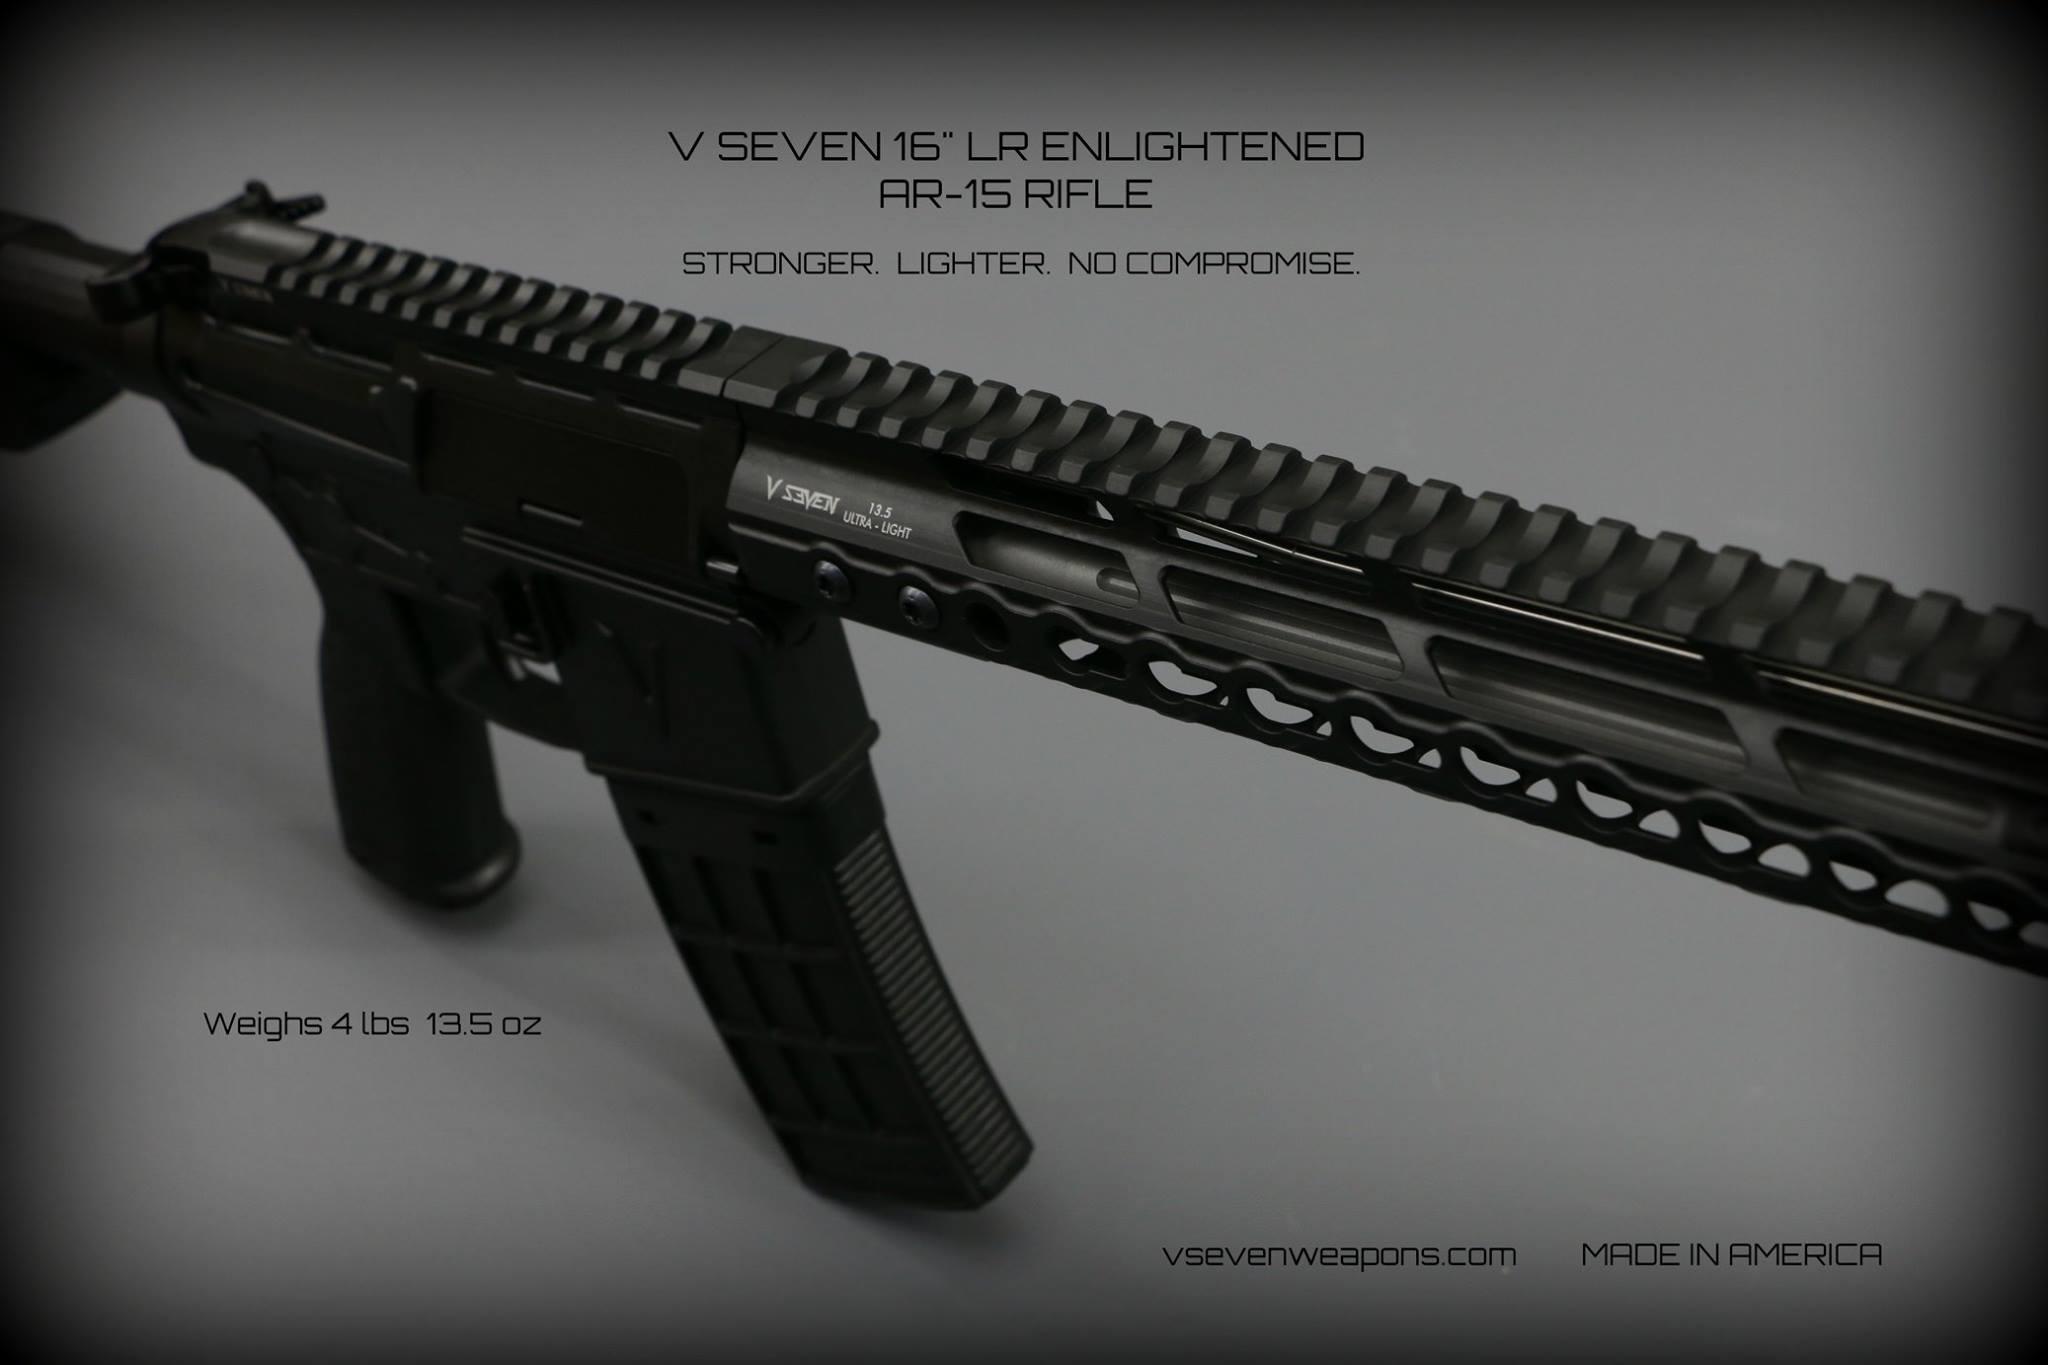 V7 | Jerking the Trigger